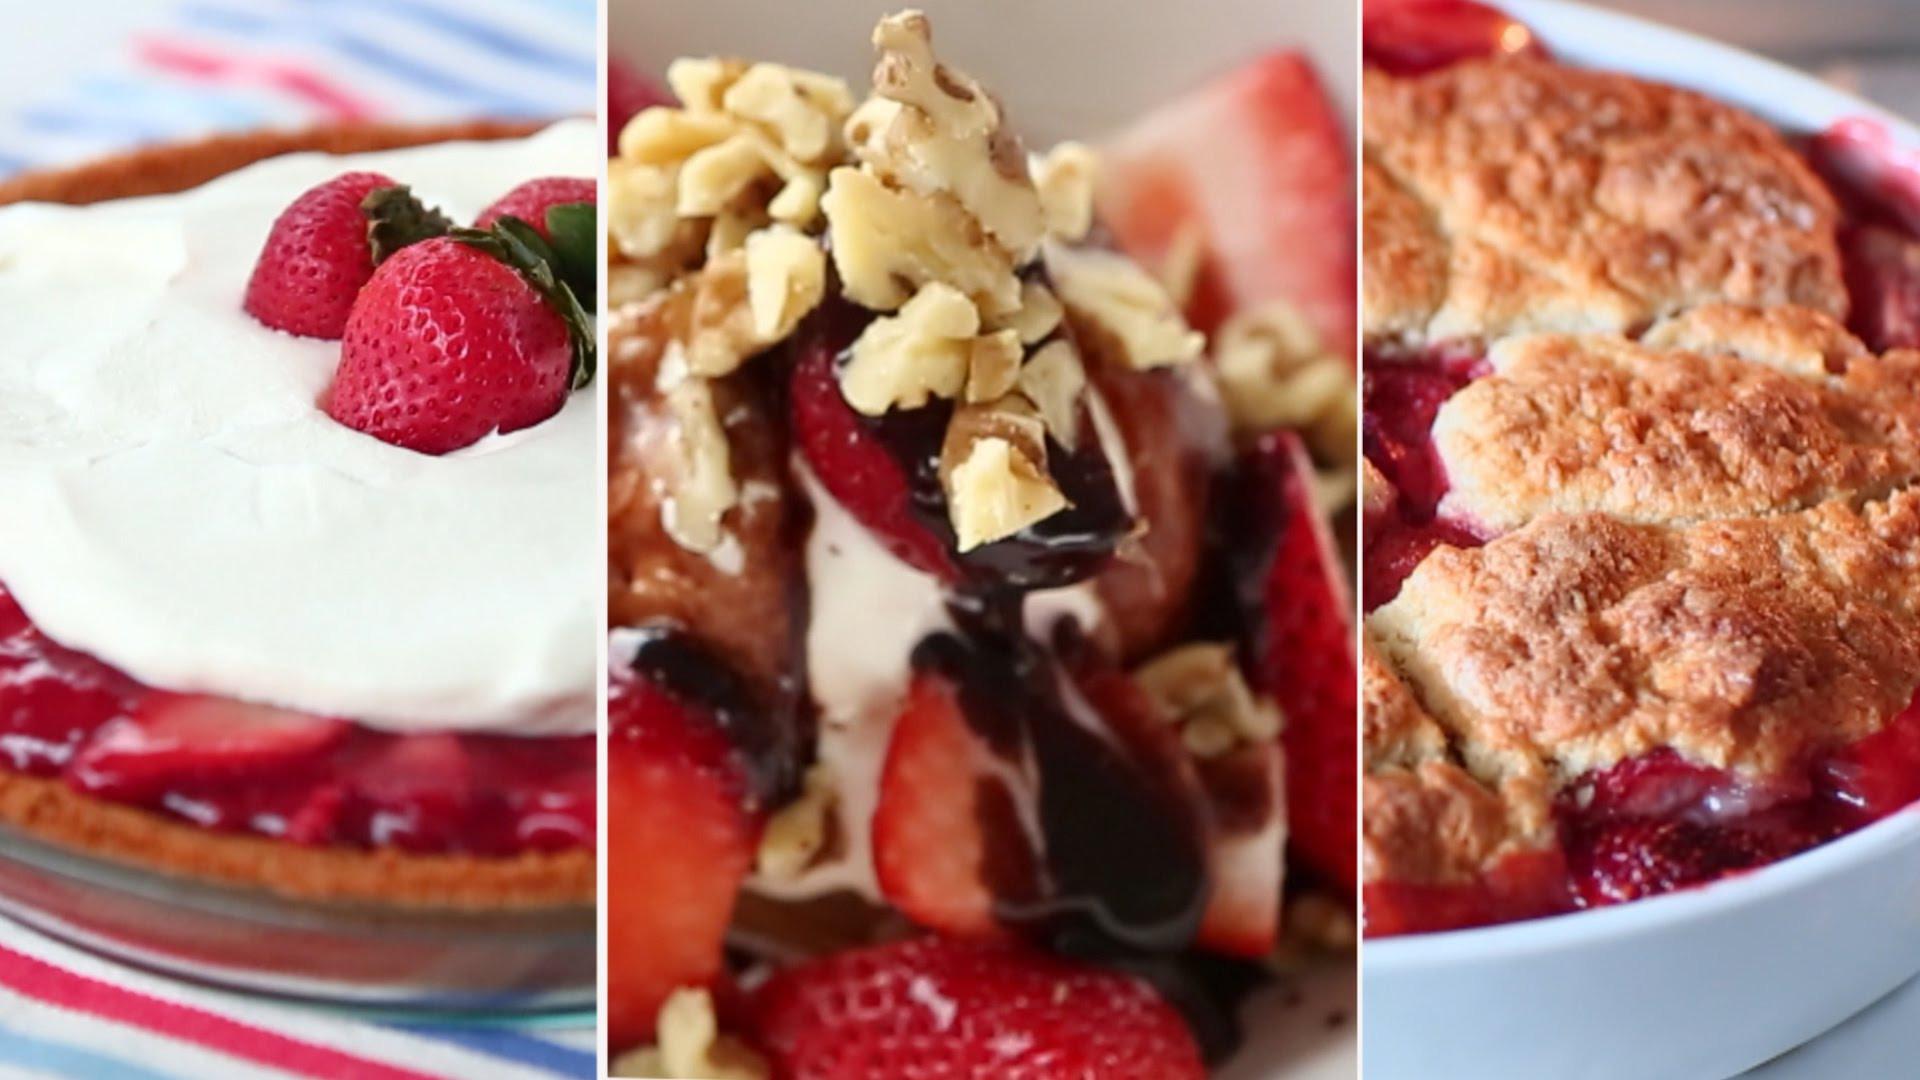 Summer Strawberry Desserts  Summer Strawberry Desserts – Everyday Food with Sarah